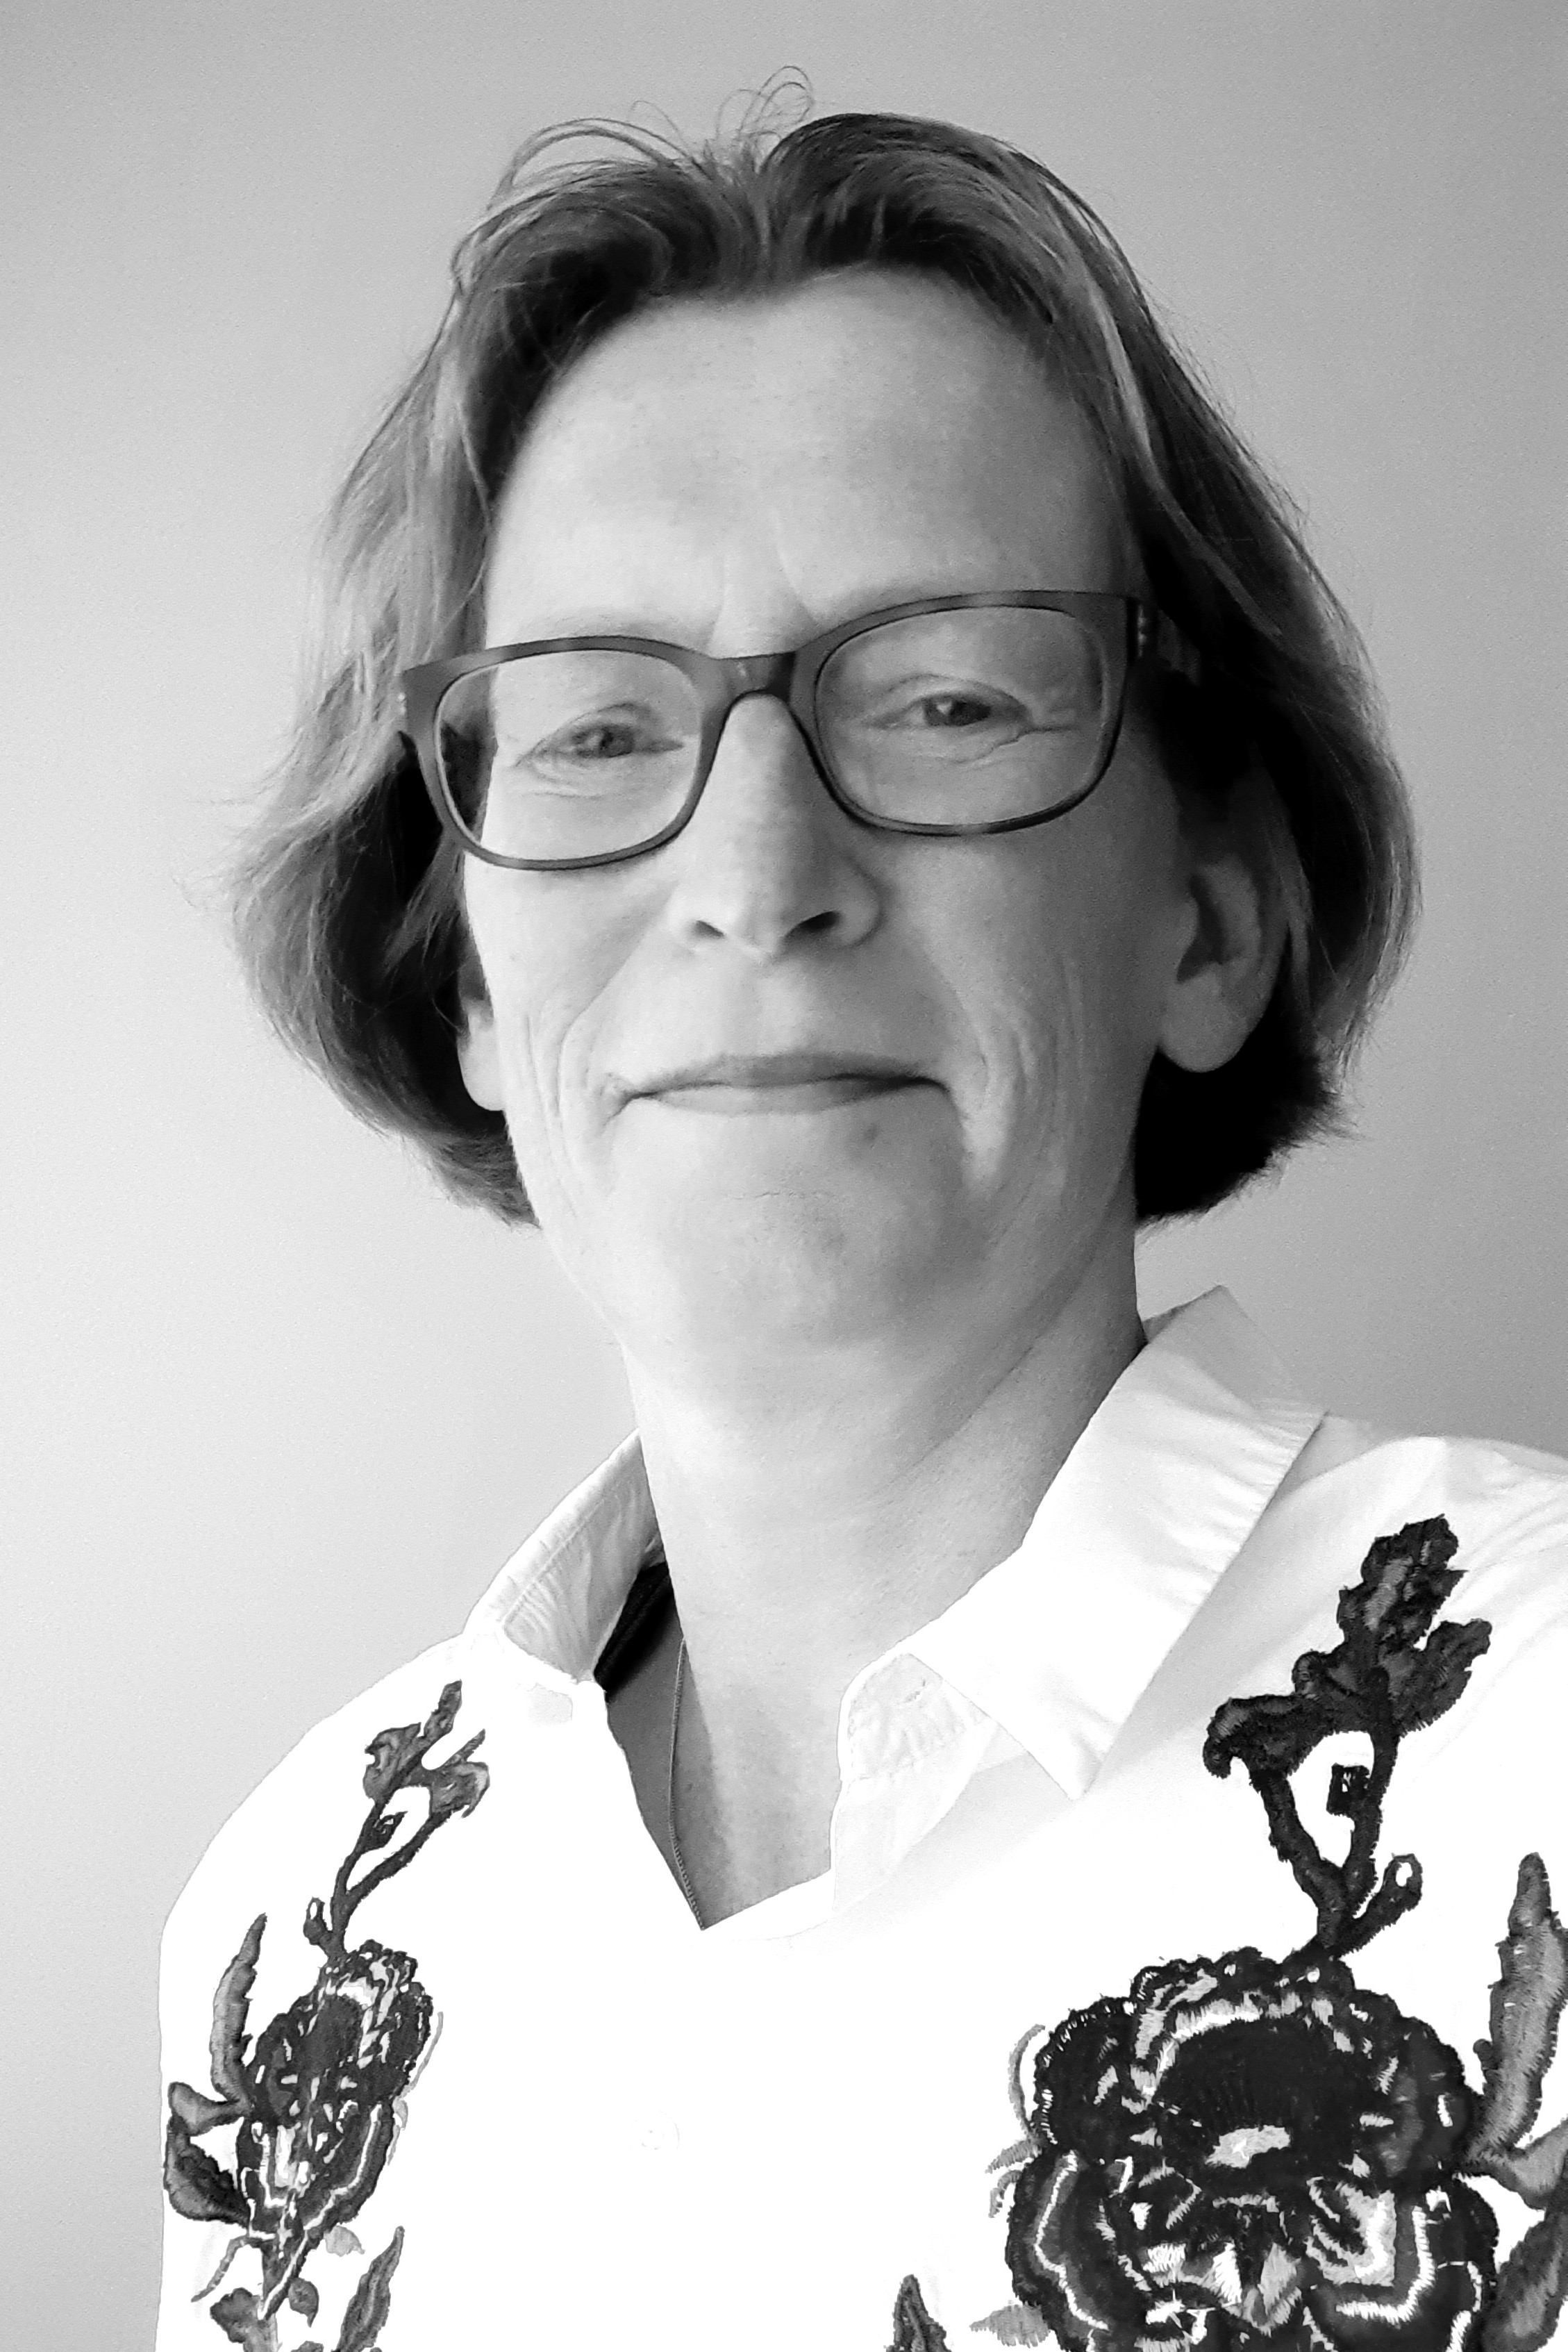 Annemarie van der Velden